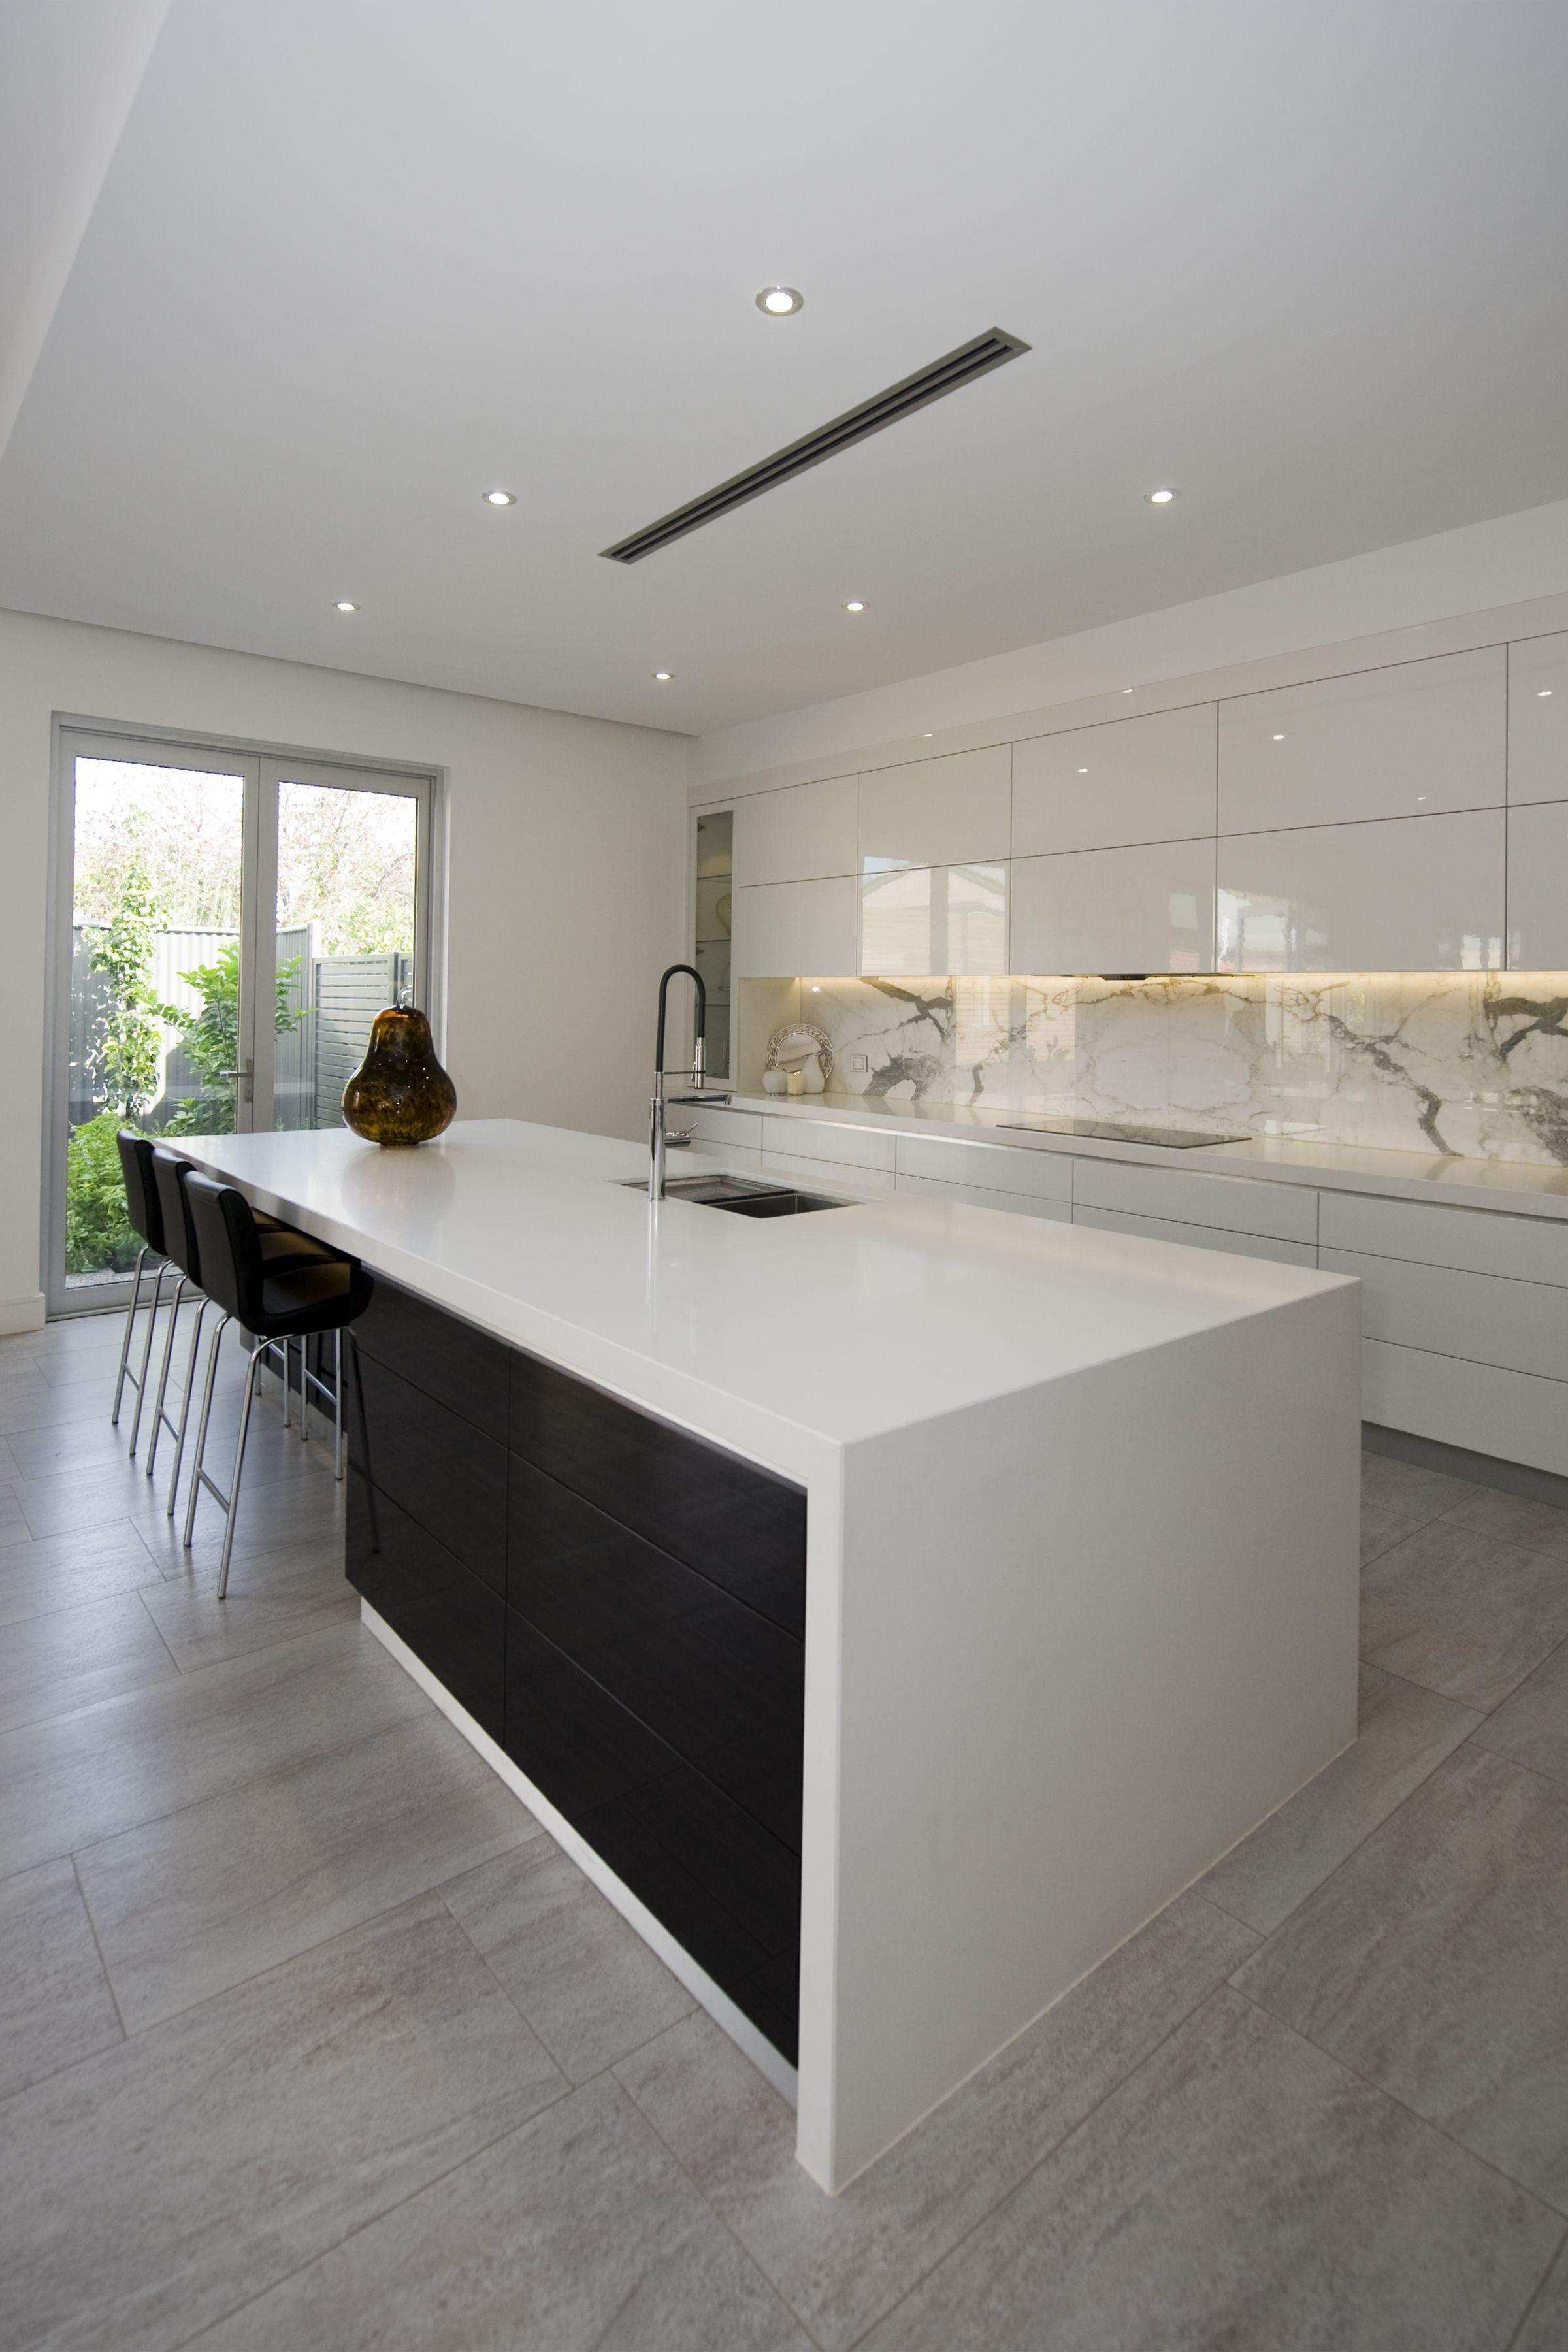 Kitchen Kitchendesign Modern Modernkitchen Blackandwhite Homeideas Kitchenideas Kitcheninspiratio Modern Kitchen Design Kitchen Interior Kitchen Design